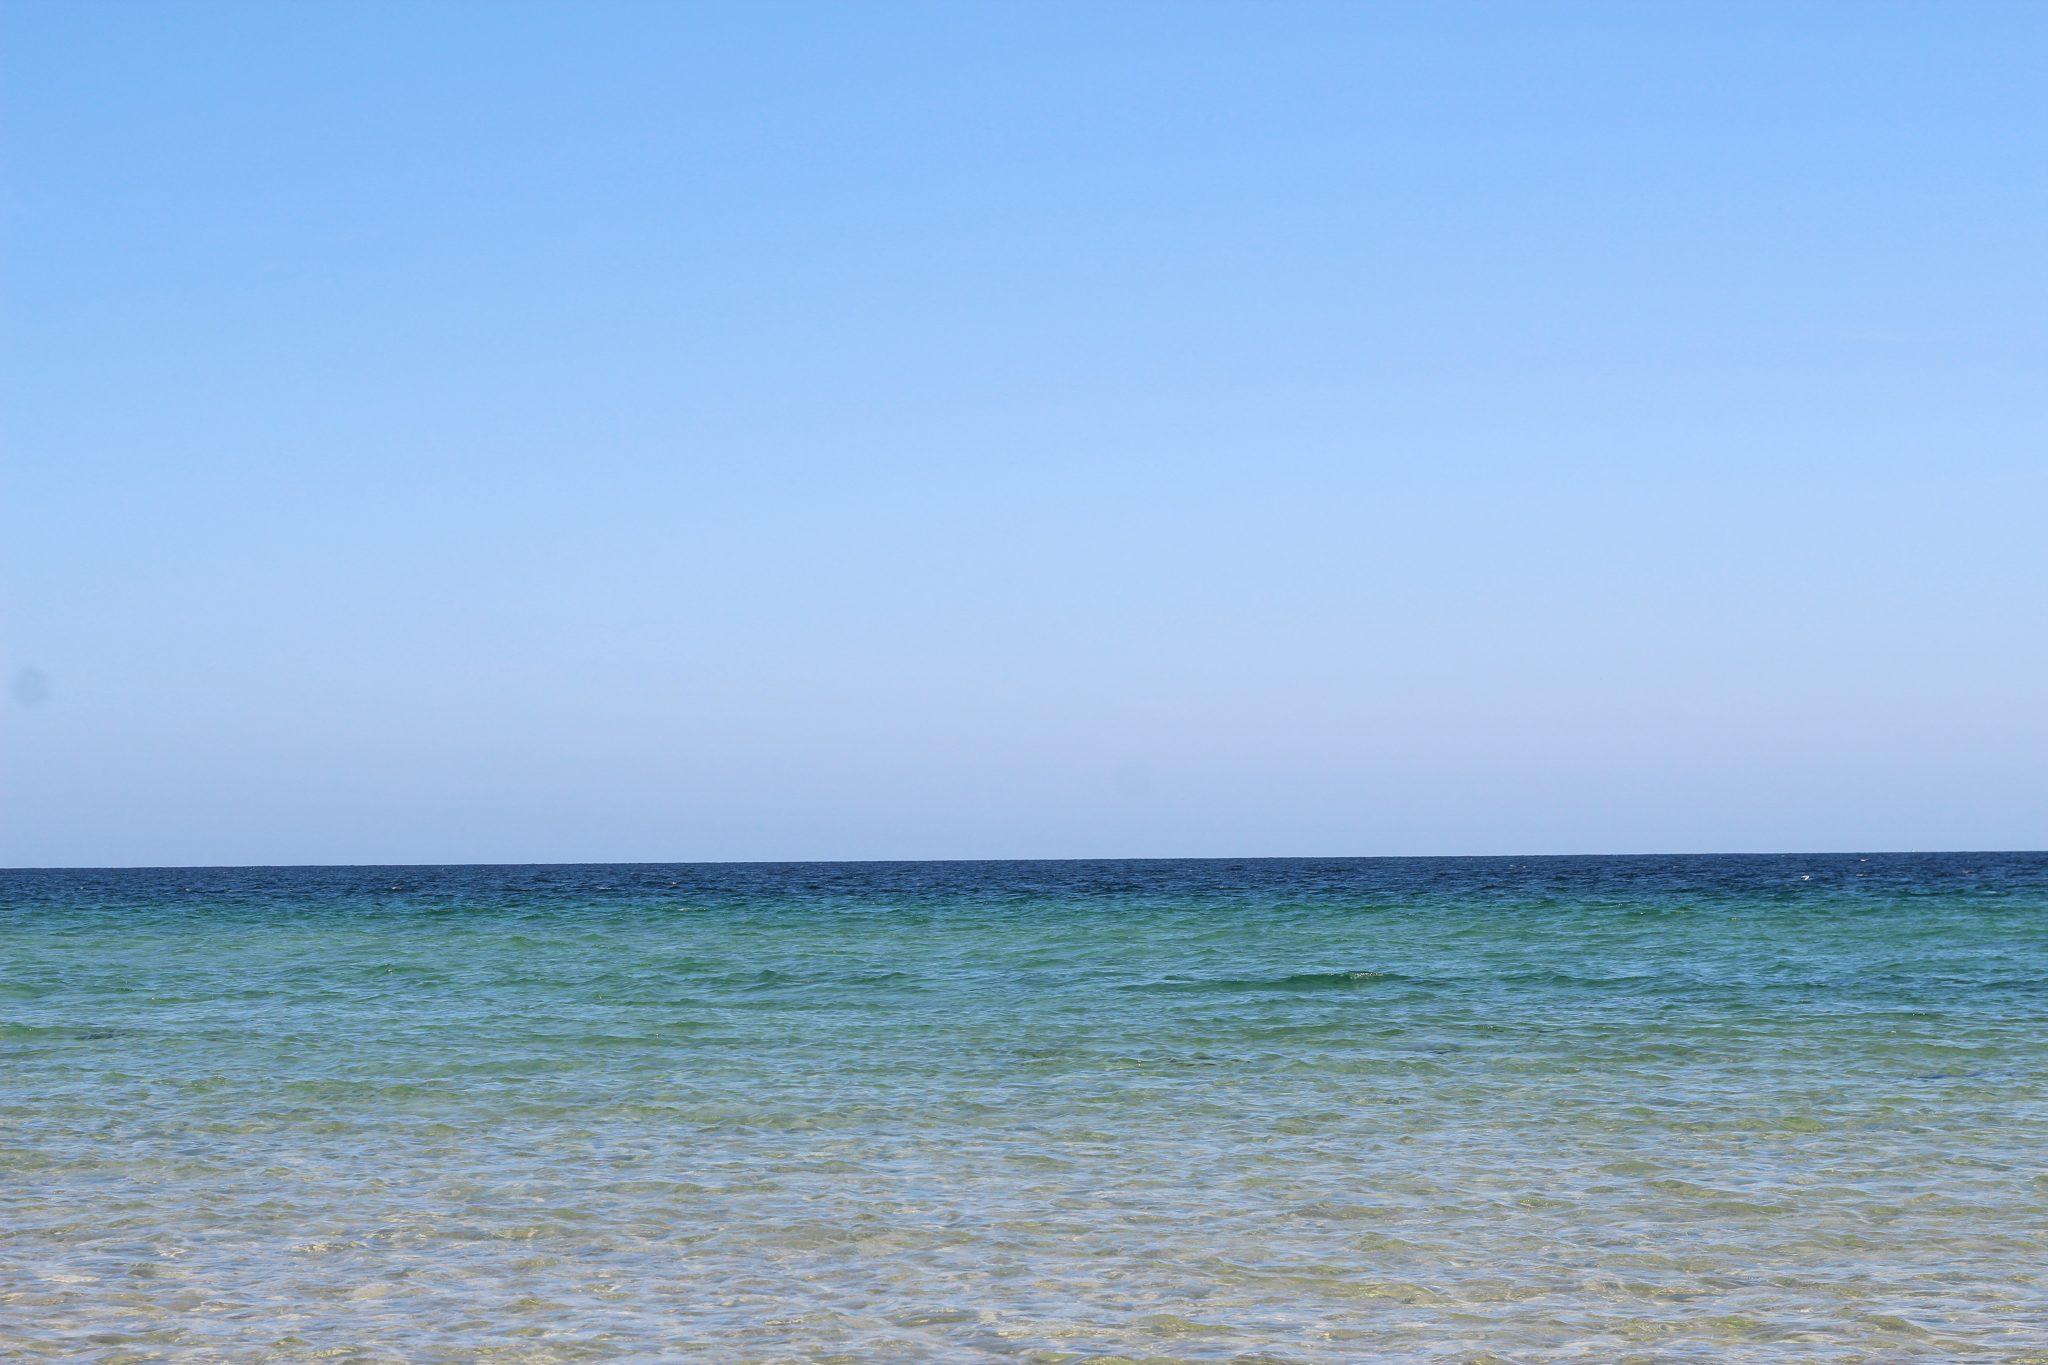 Cornwall beaches - The Style of Laura Jane